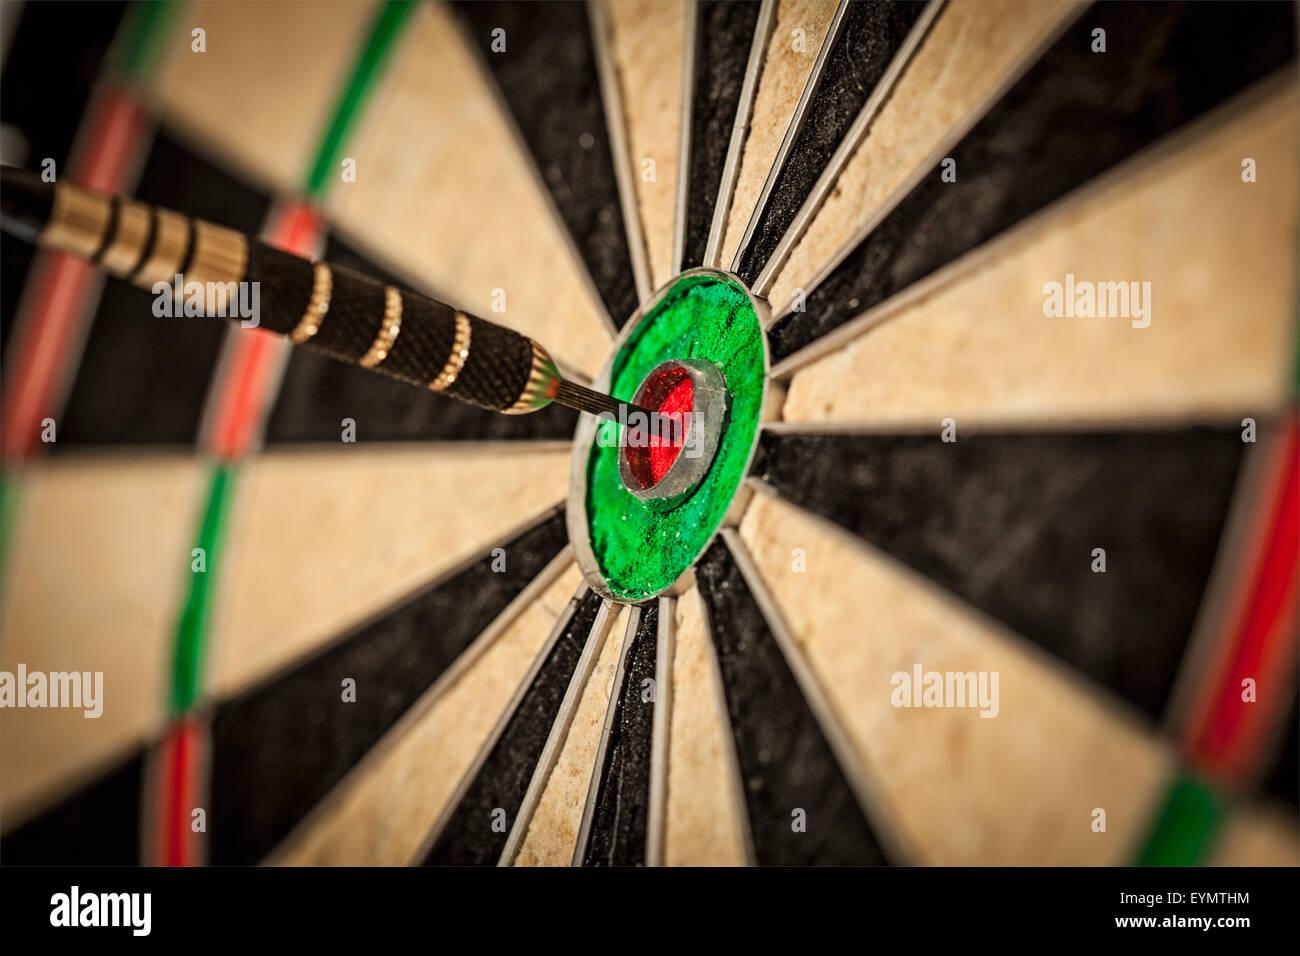 Success hitting target aim goal achievement concept background - dart in bull's eye close up Stock Photo